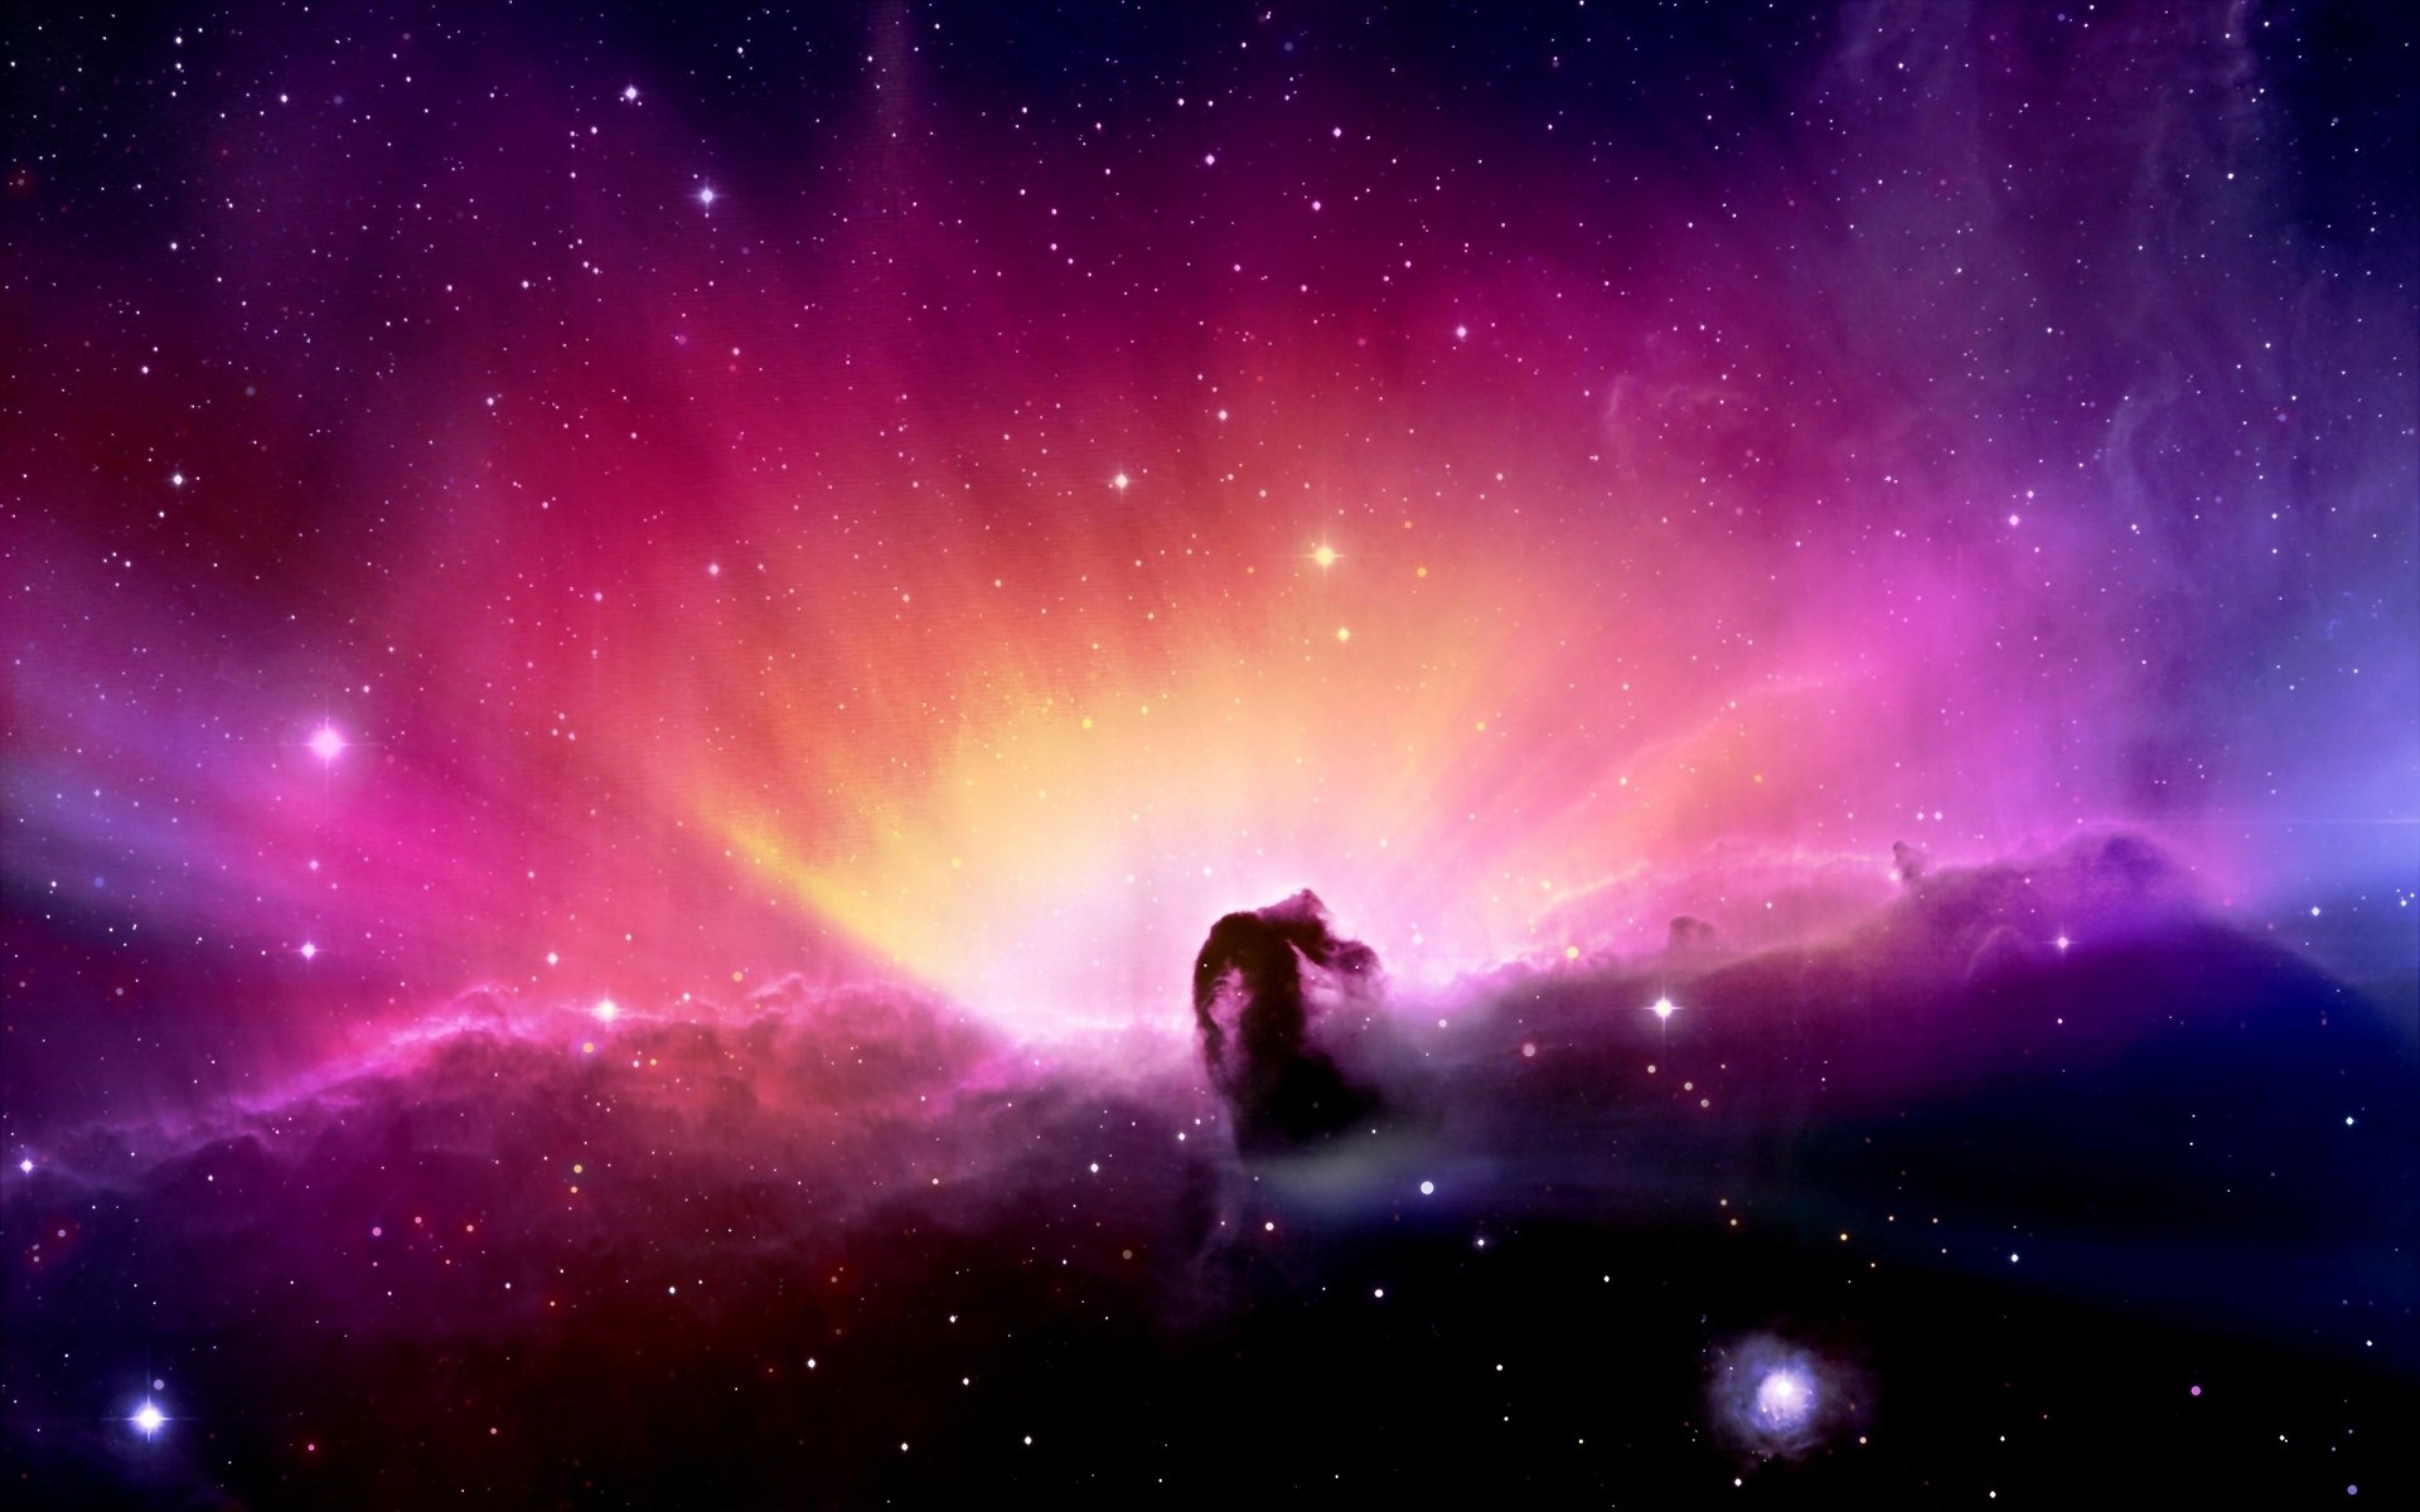 Sky Spot Star Dark Night Colorful Wallpaper Background Ultra HD 3840x2400